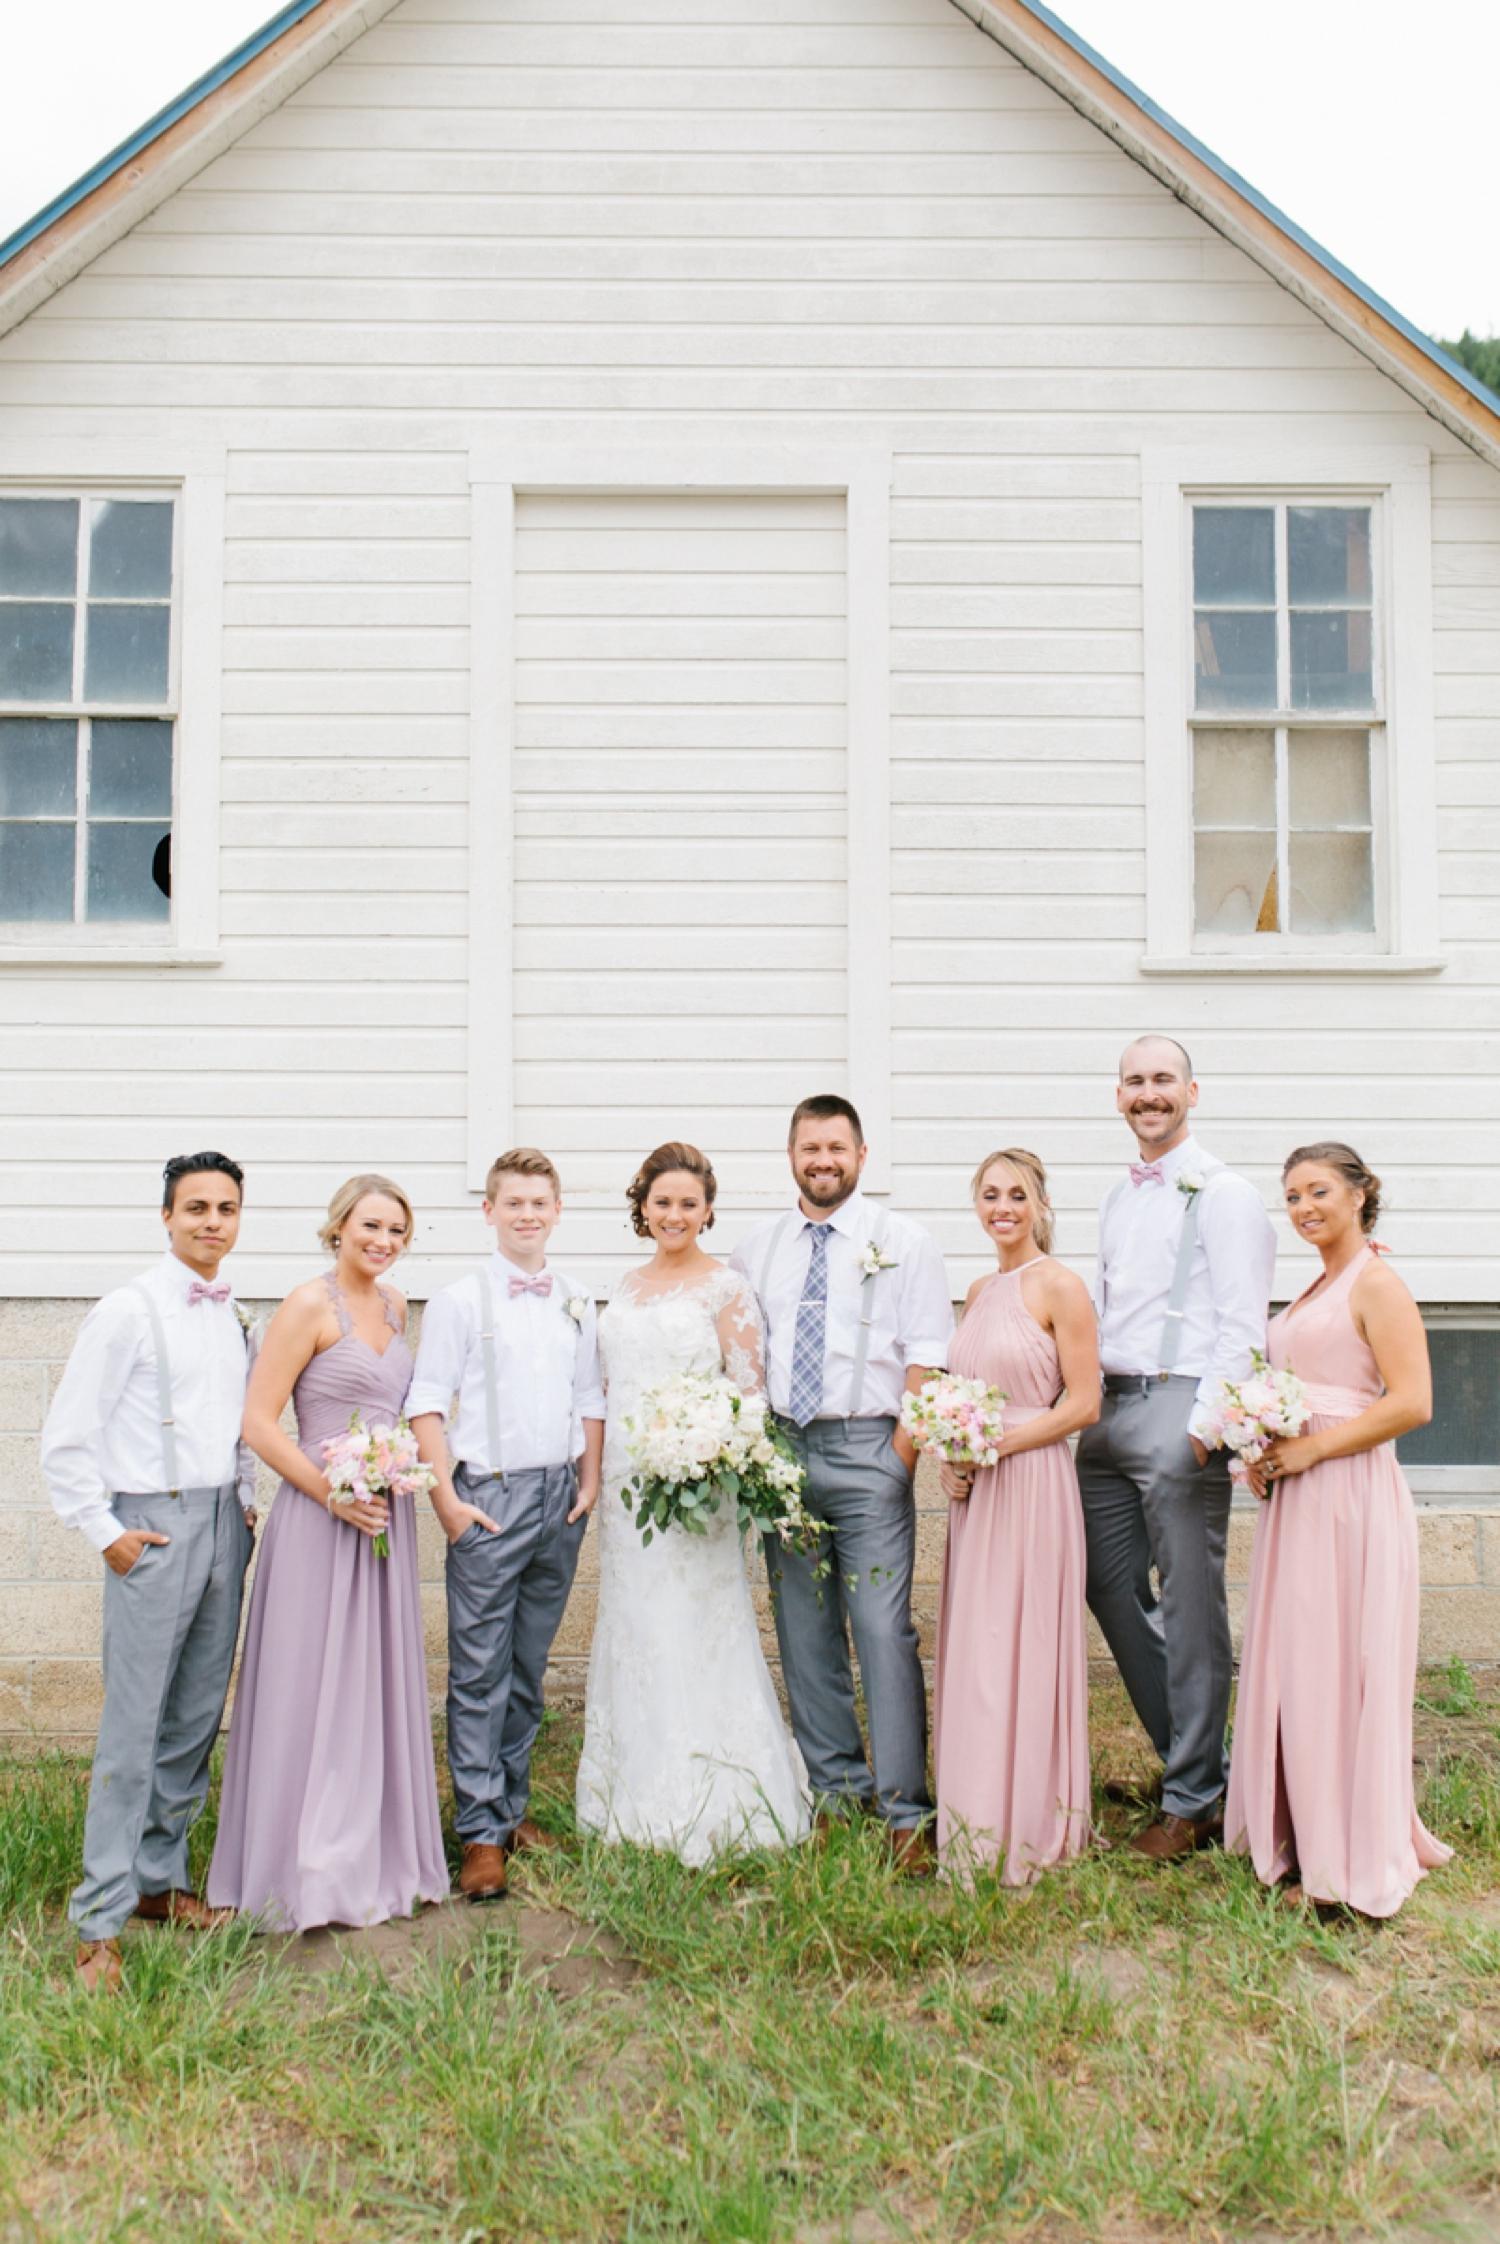 Wenatchee Wedding Photographer   Hampton Hideaway   Summer Rustic Wedding Eastern Washington   Emma Rose Company   Pastel Wedding Inspiration   Lace Wedding   Pacific Northwest Wedding 58.jpg